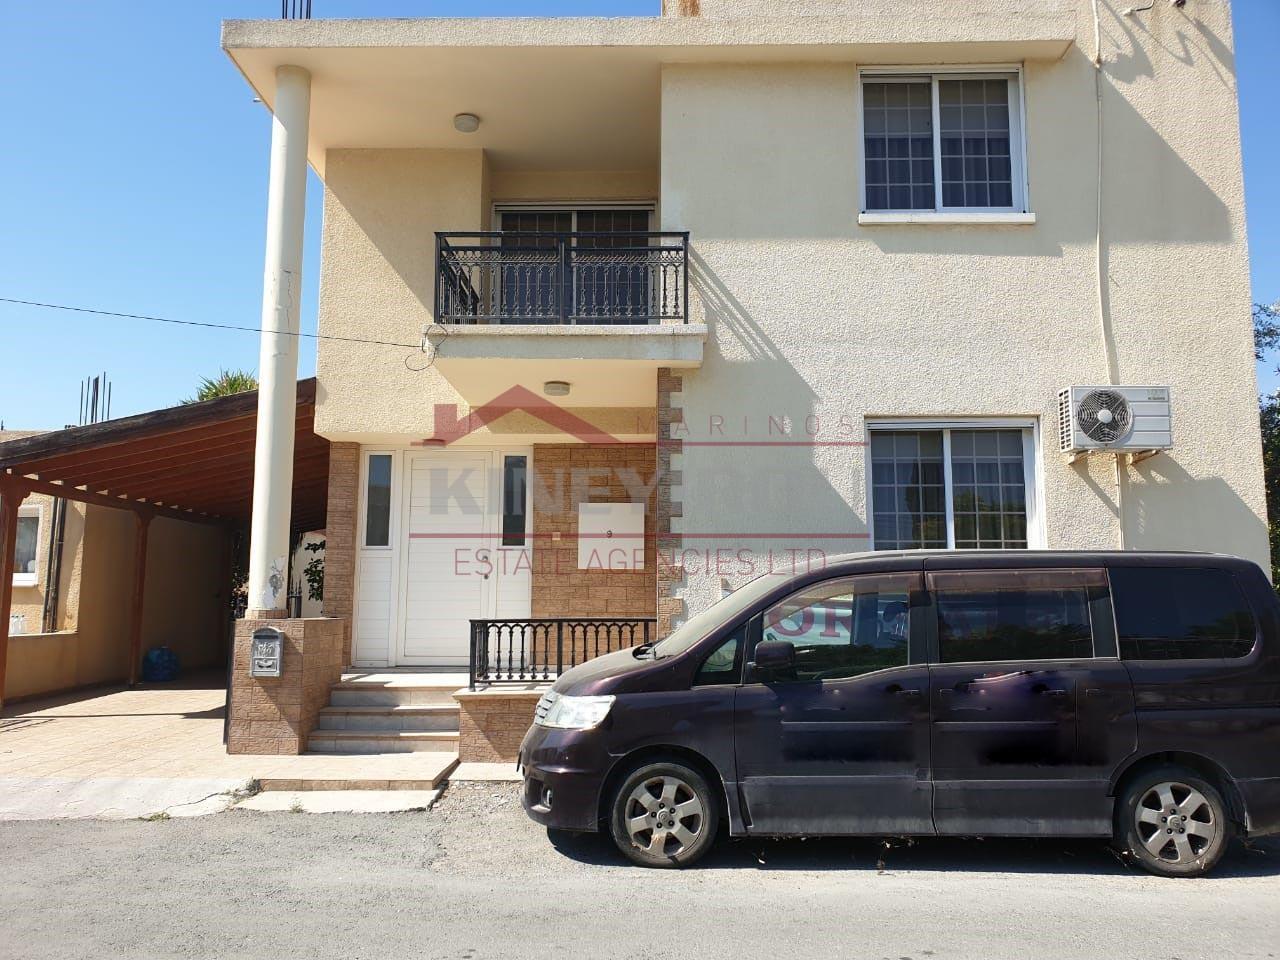 3 Bedroom House near the Center, Larnaca